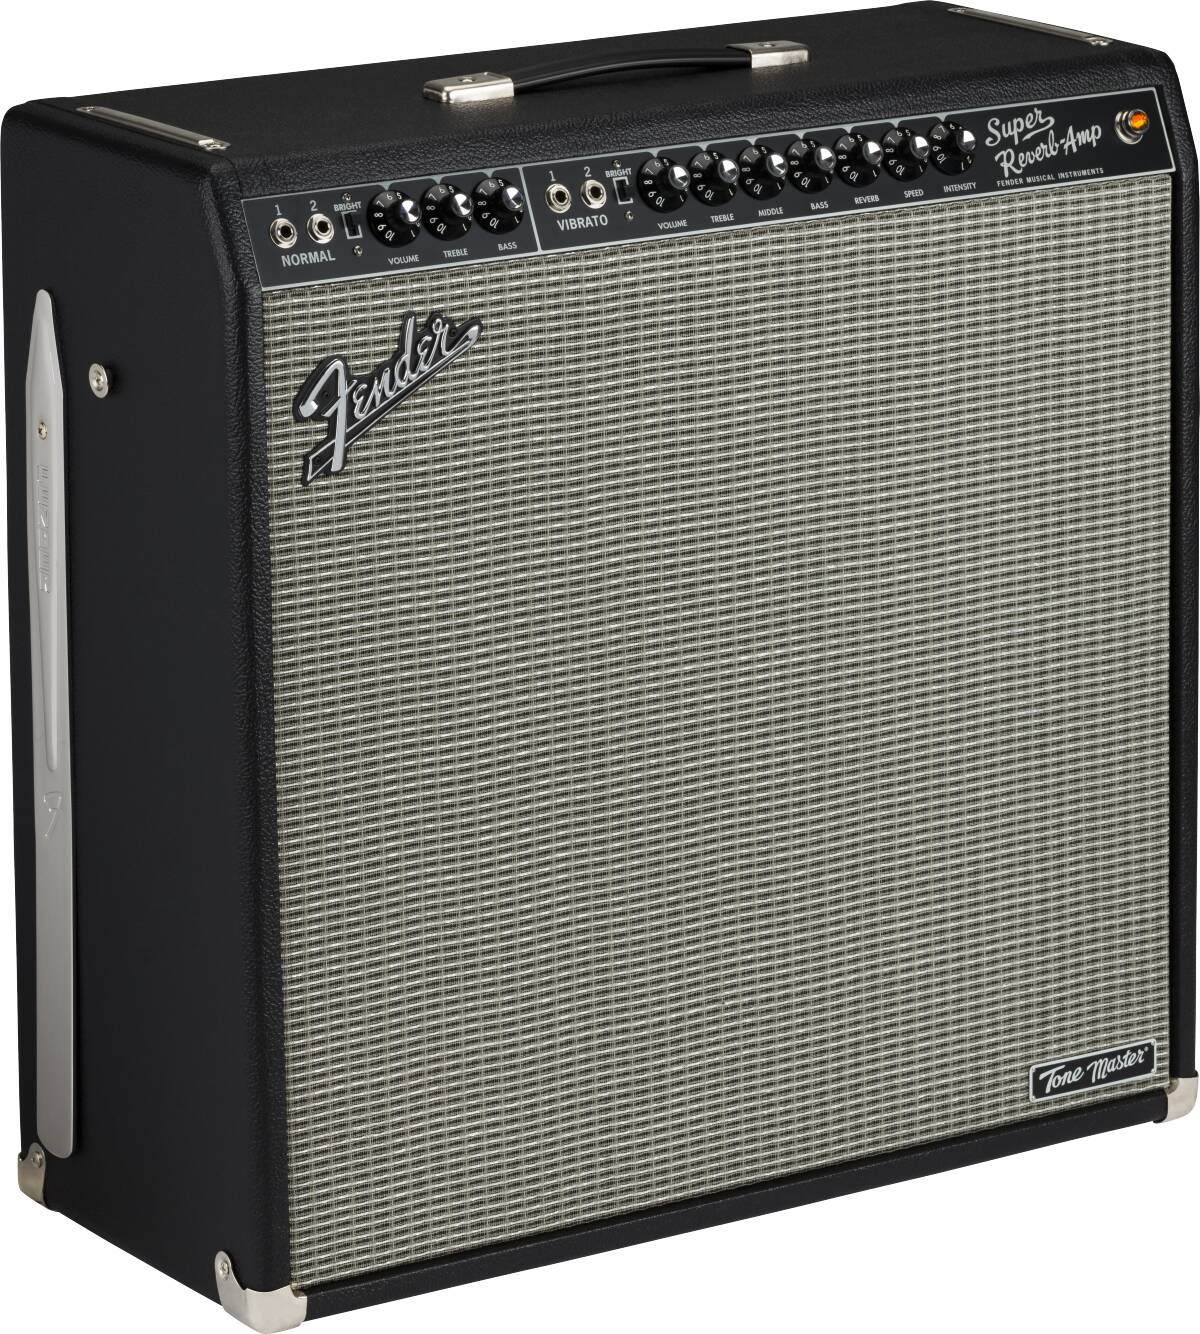 Fender Tone Master Super Reverb : photo 4